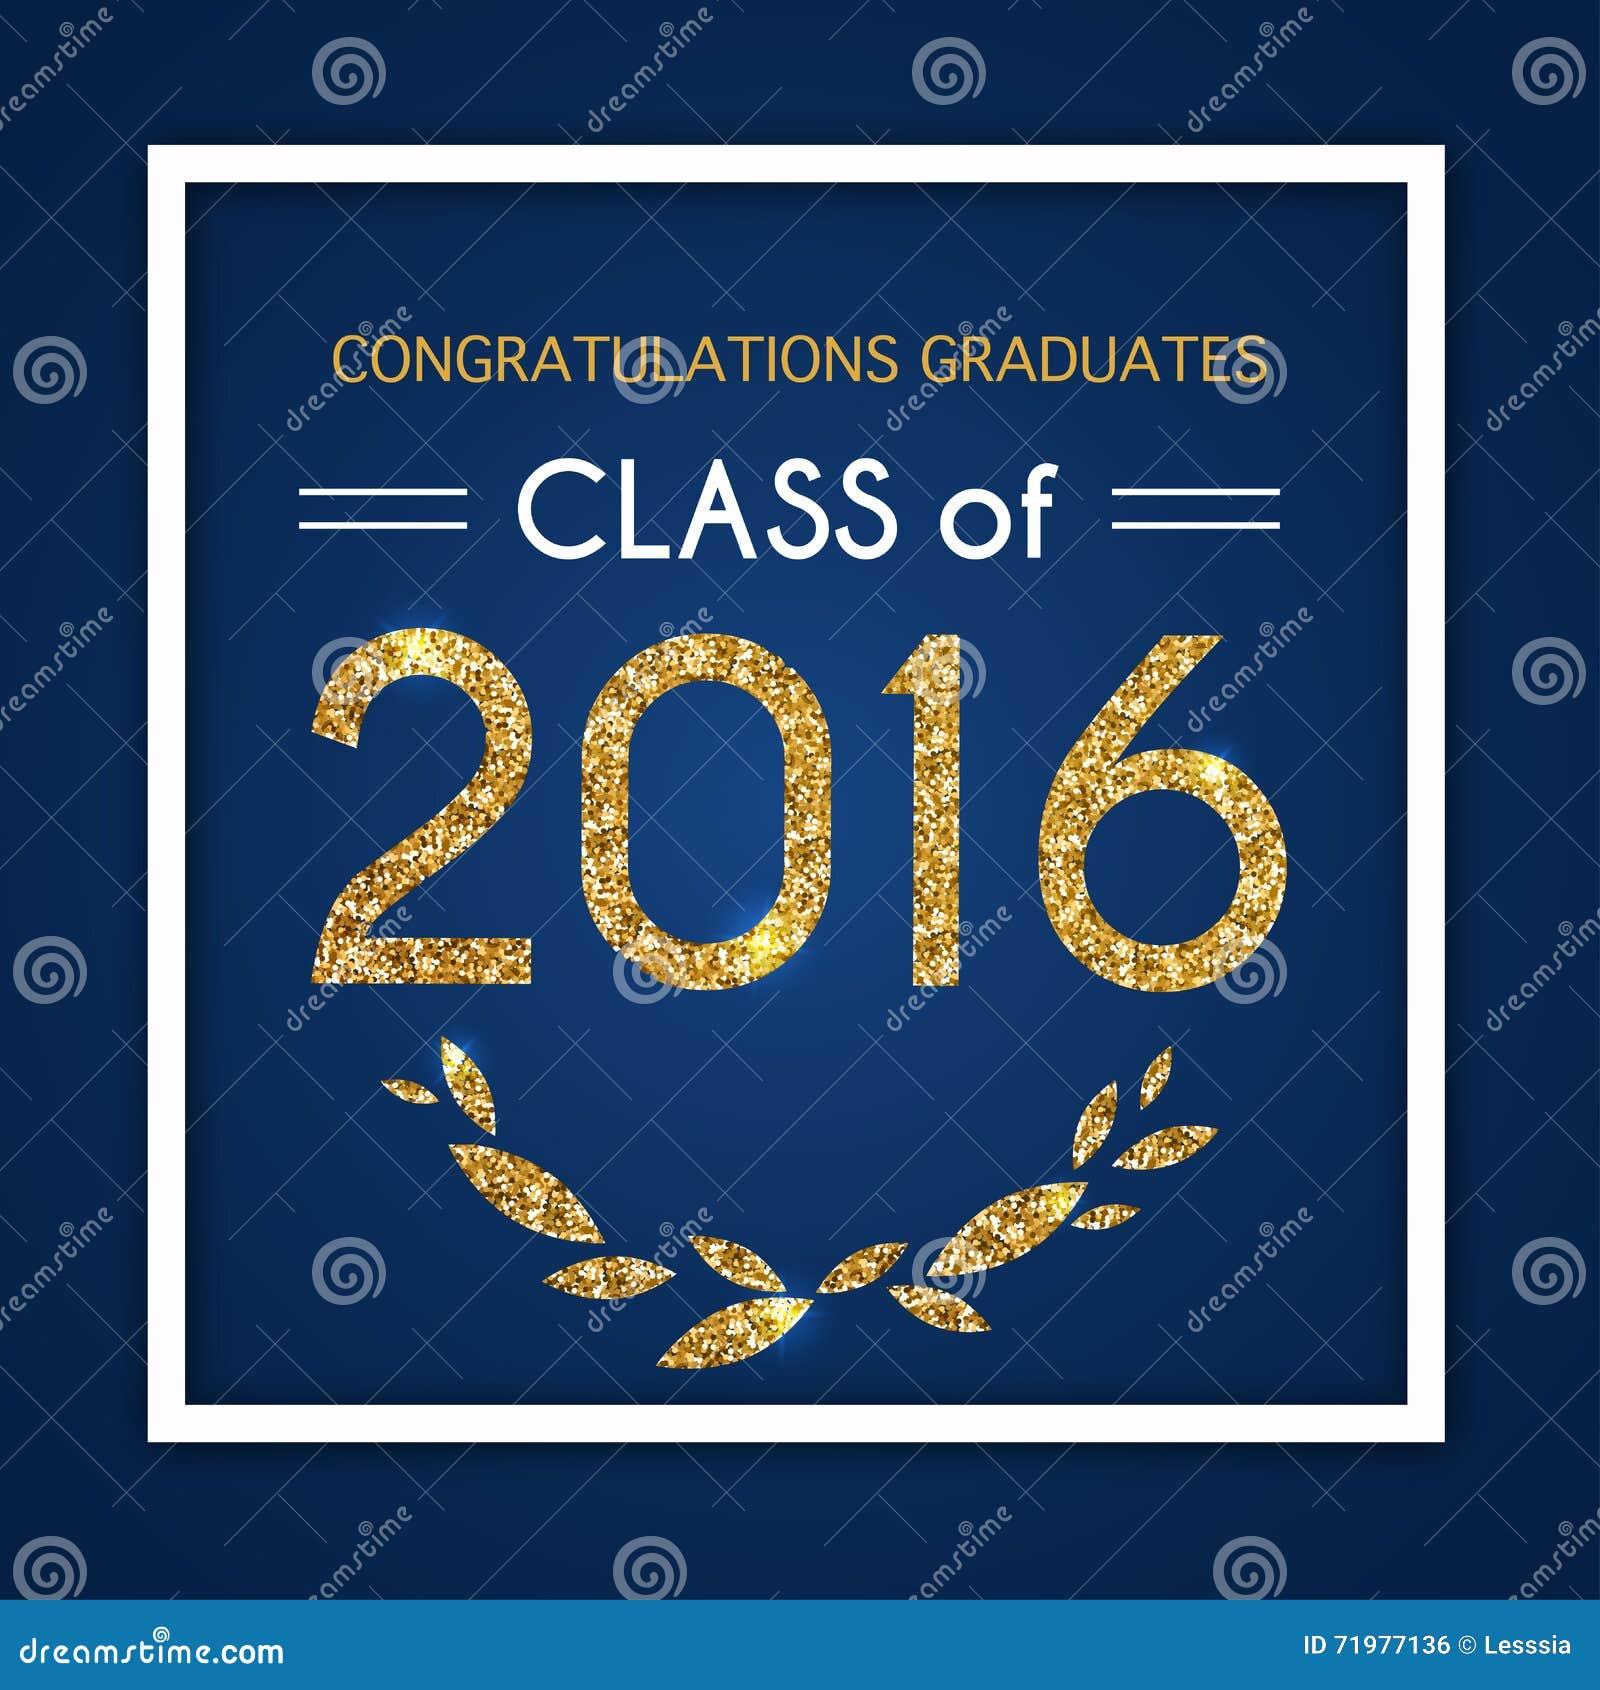 congratulations on graduation 2016 class of  graduation